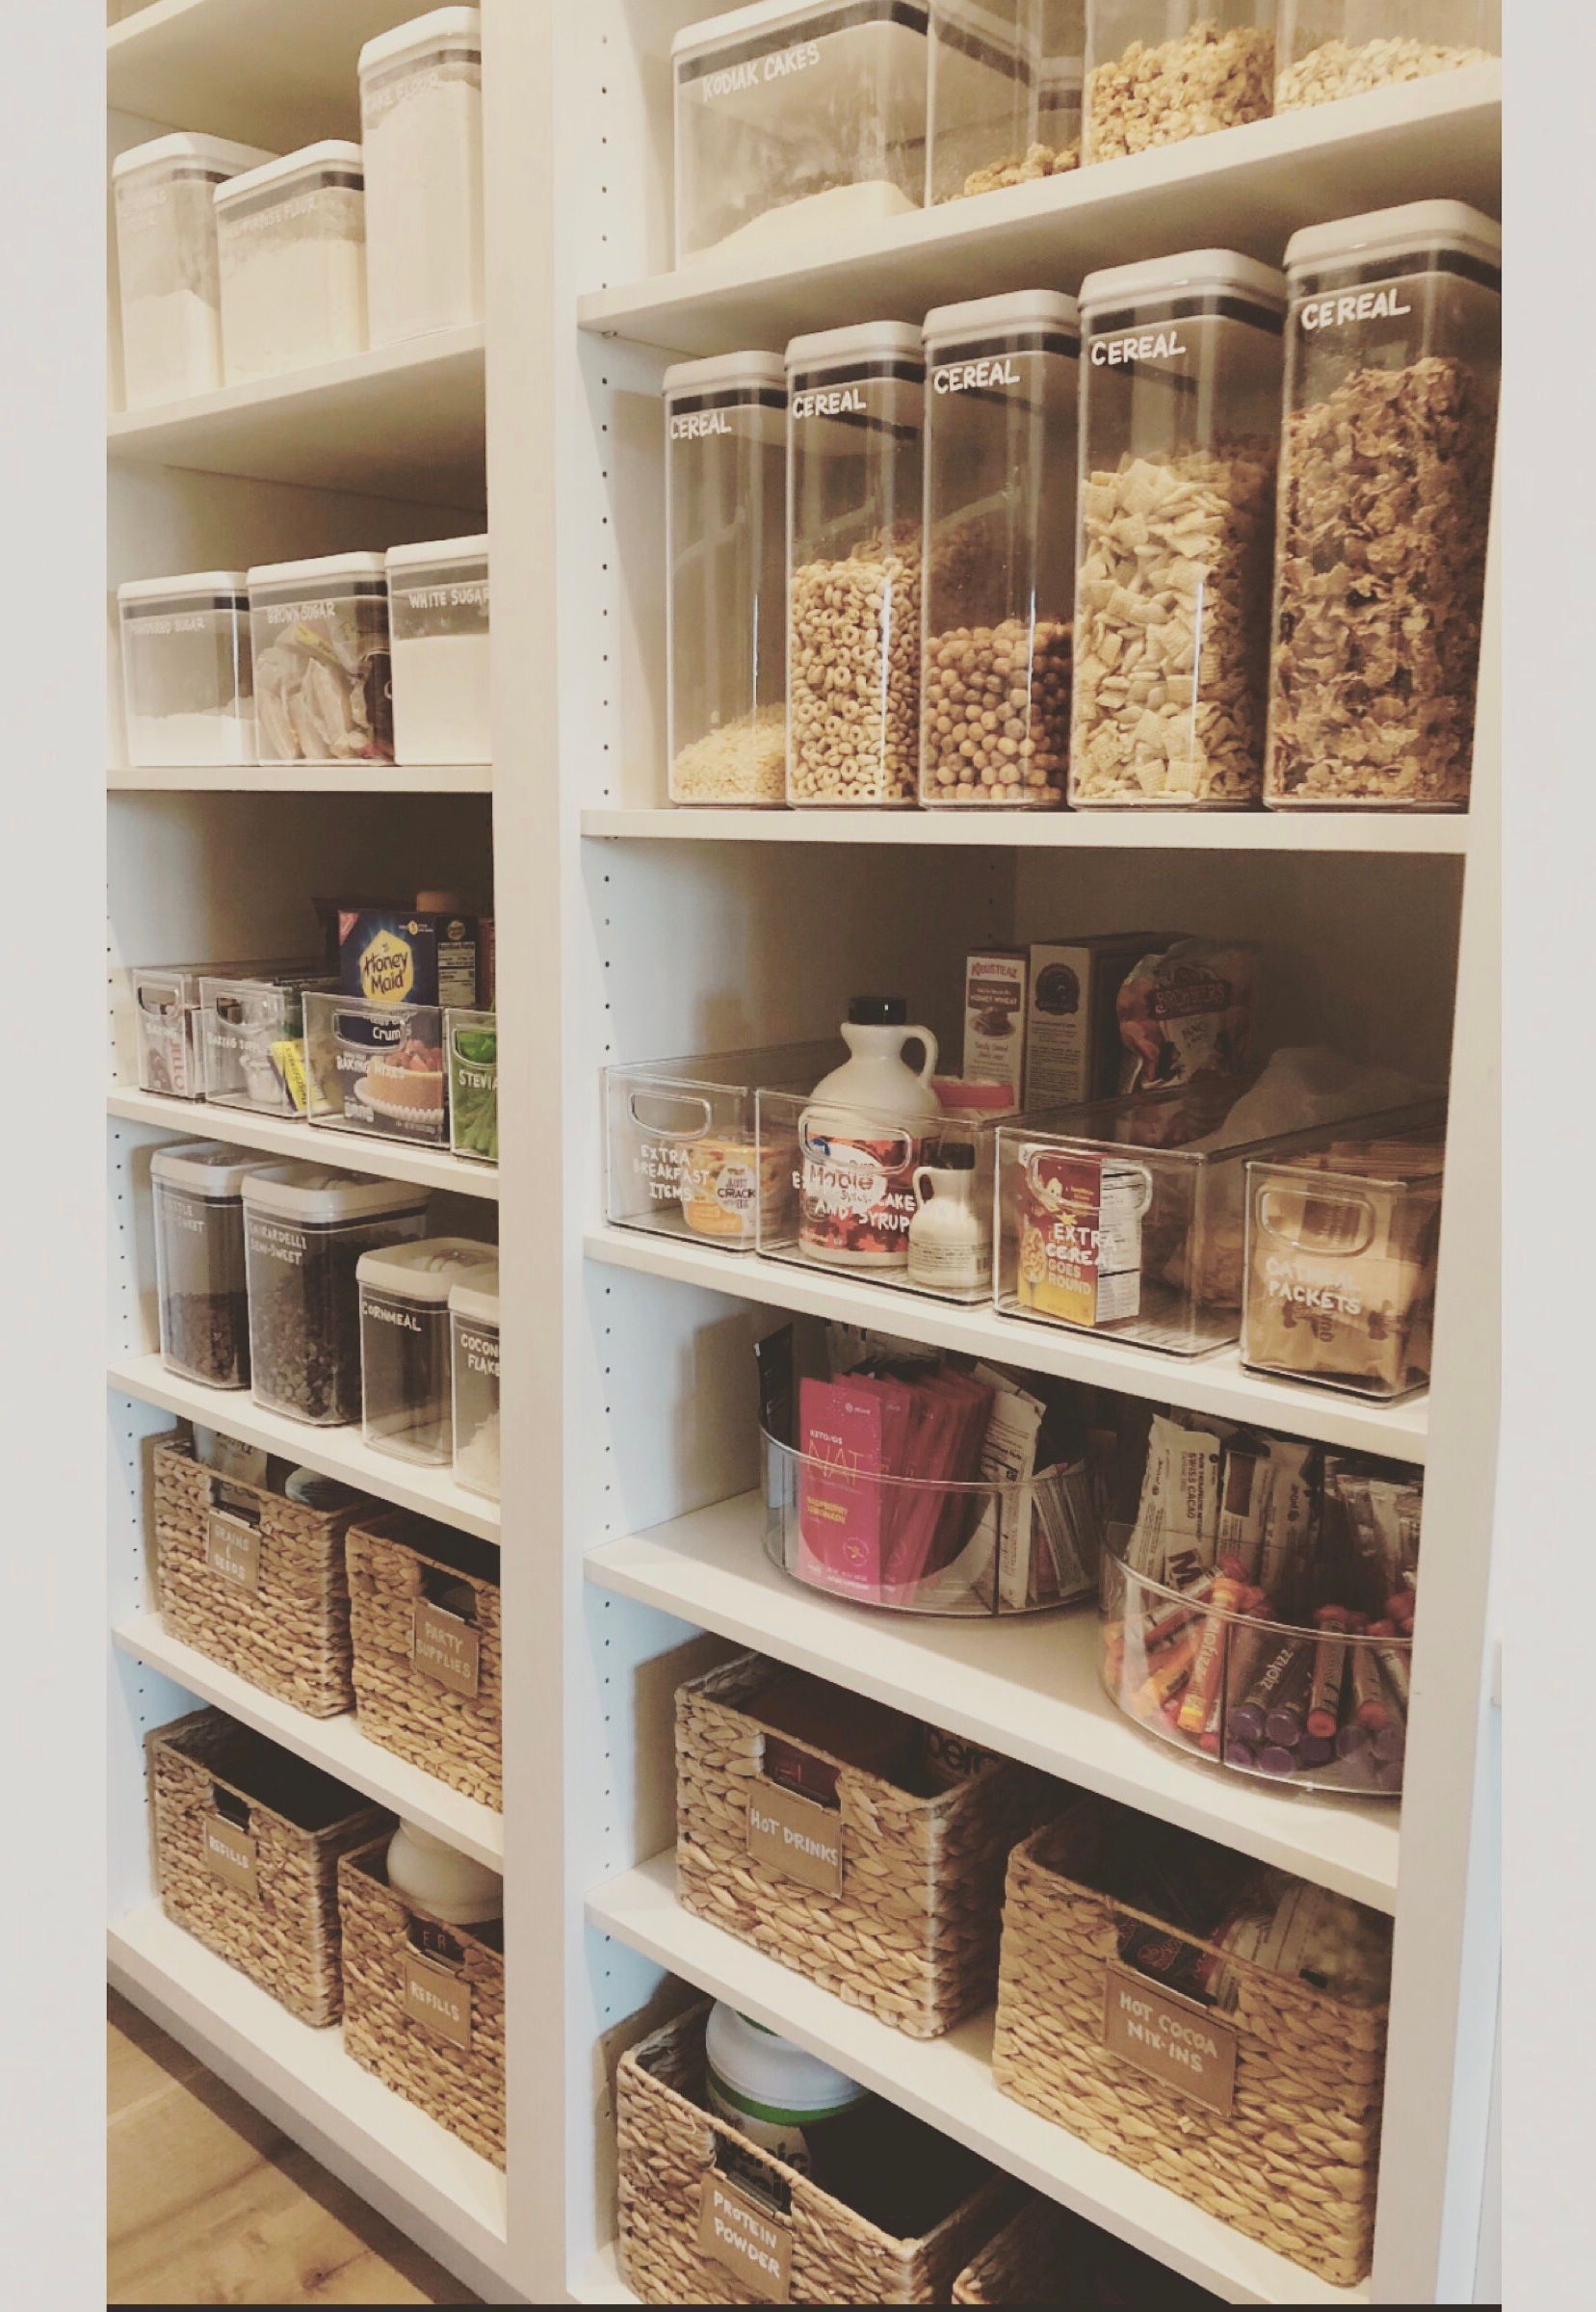 Pretty Organized Shelves Shelf Organization Bed Bath And Beyond Pantry Organization